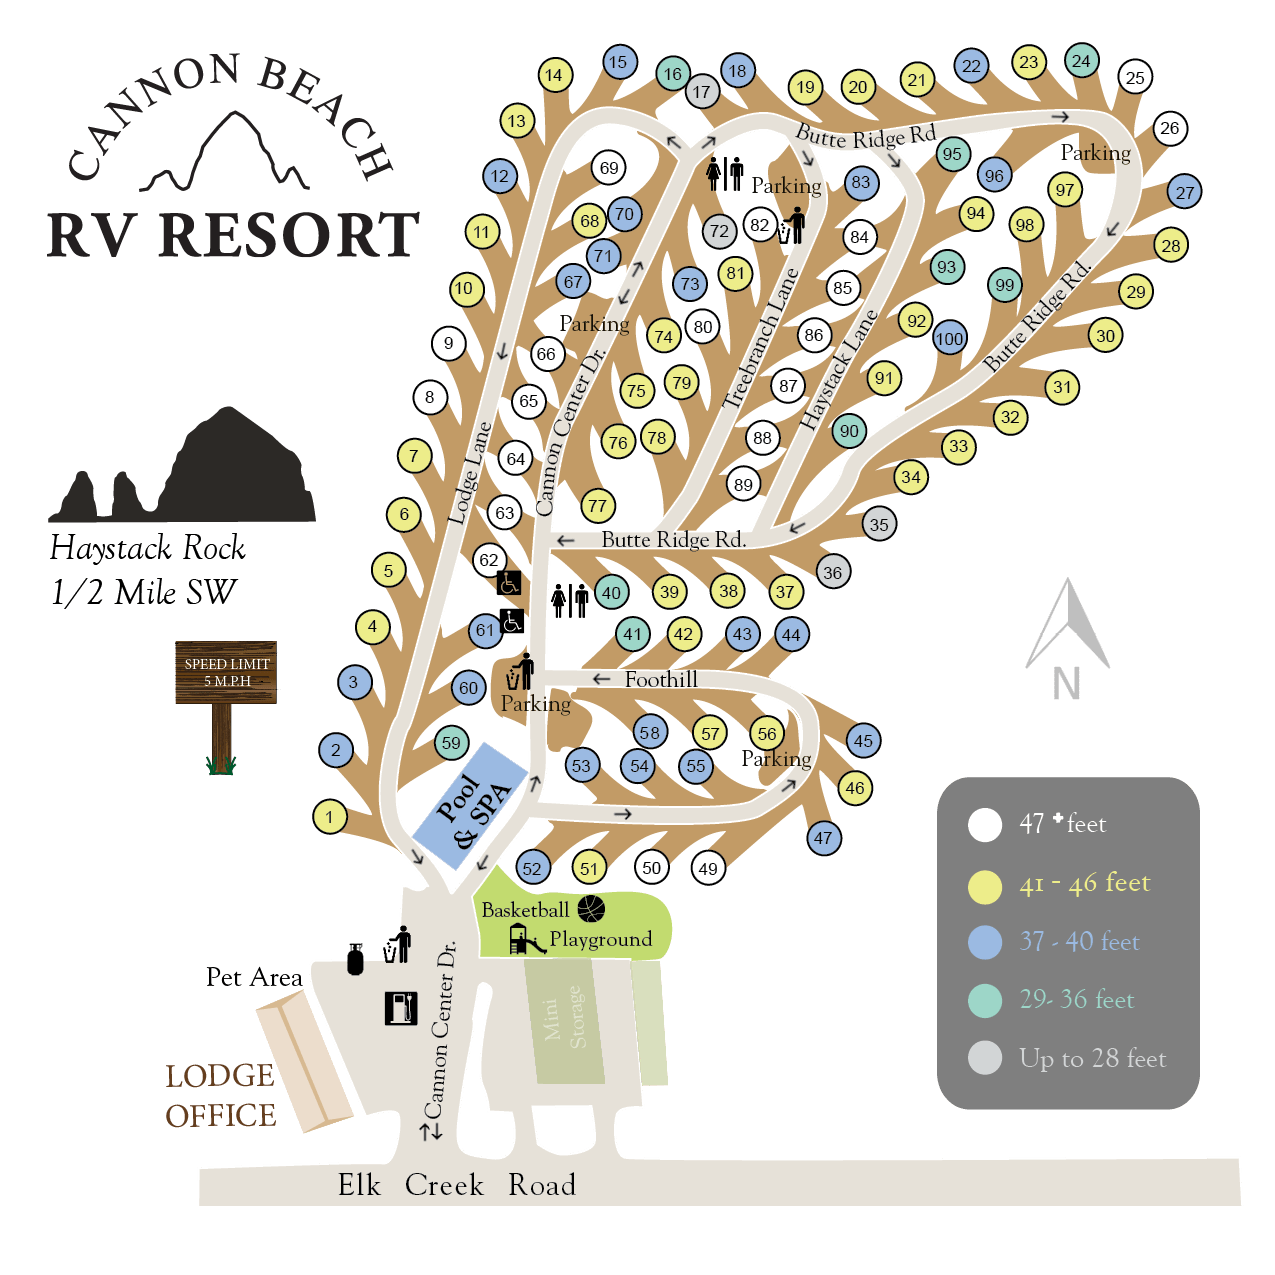 Cannon Beach RV Resort Map